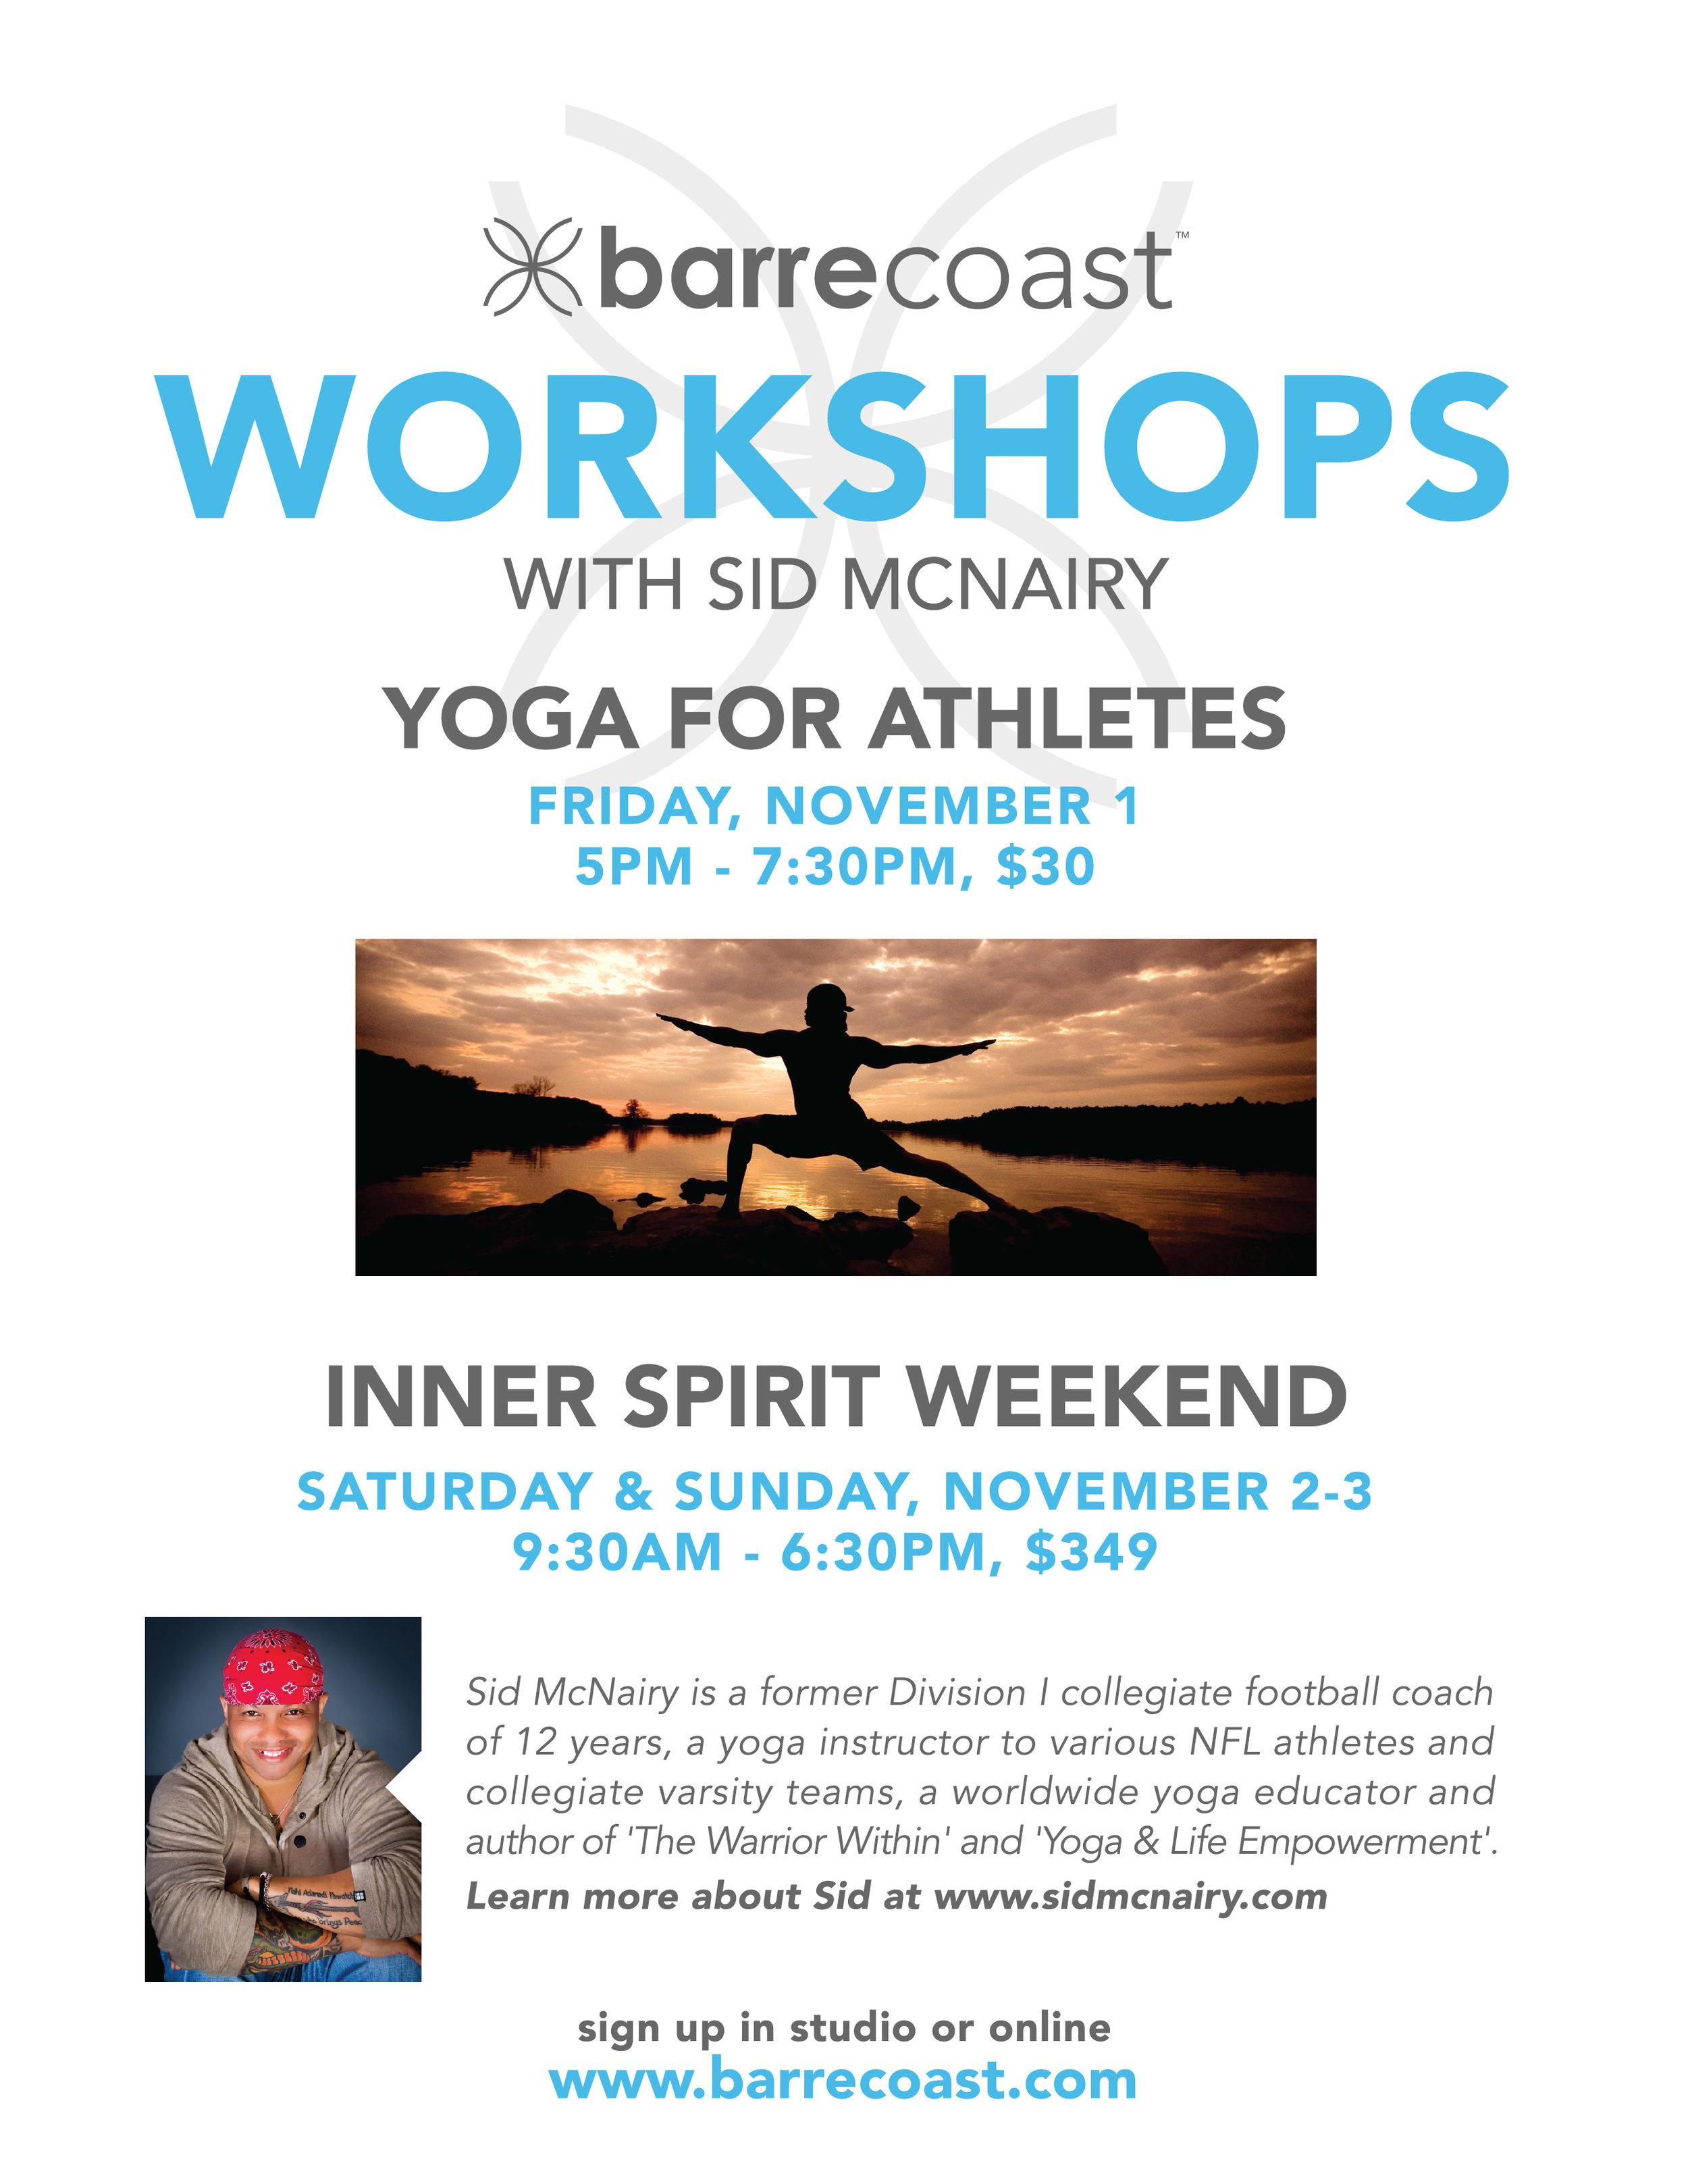 barre-coast-workshop-sid-mcnairy-yoga-for-athletes